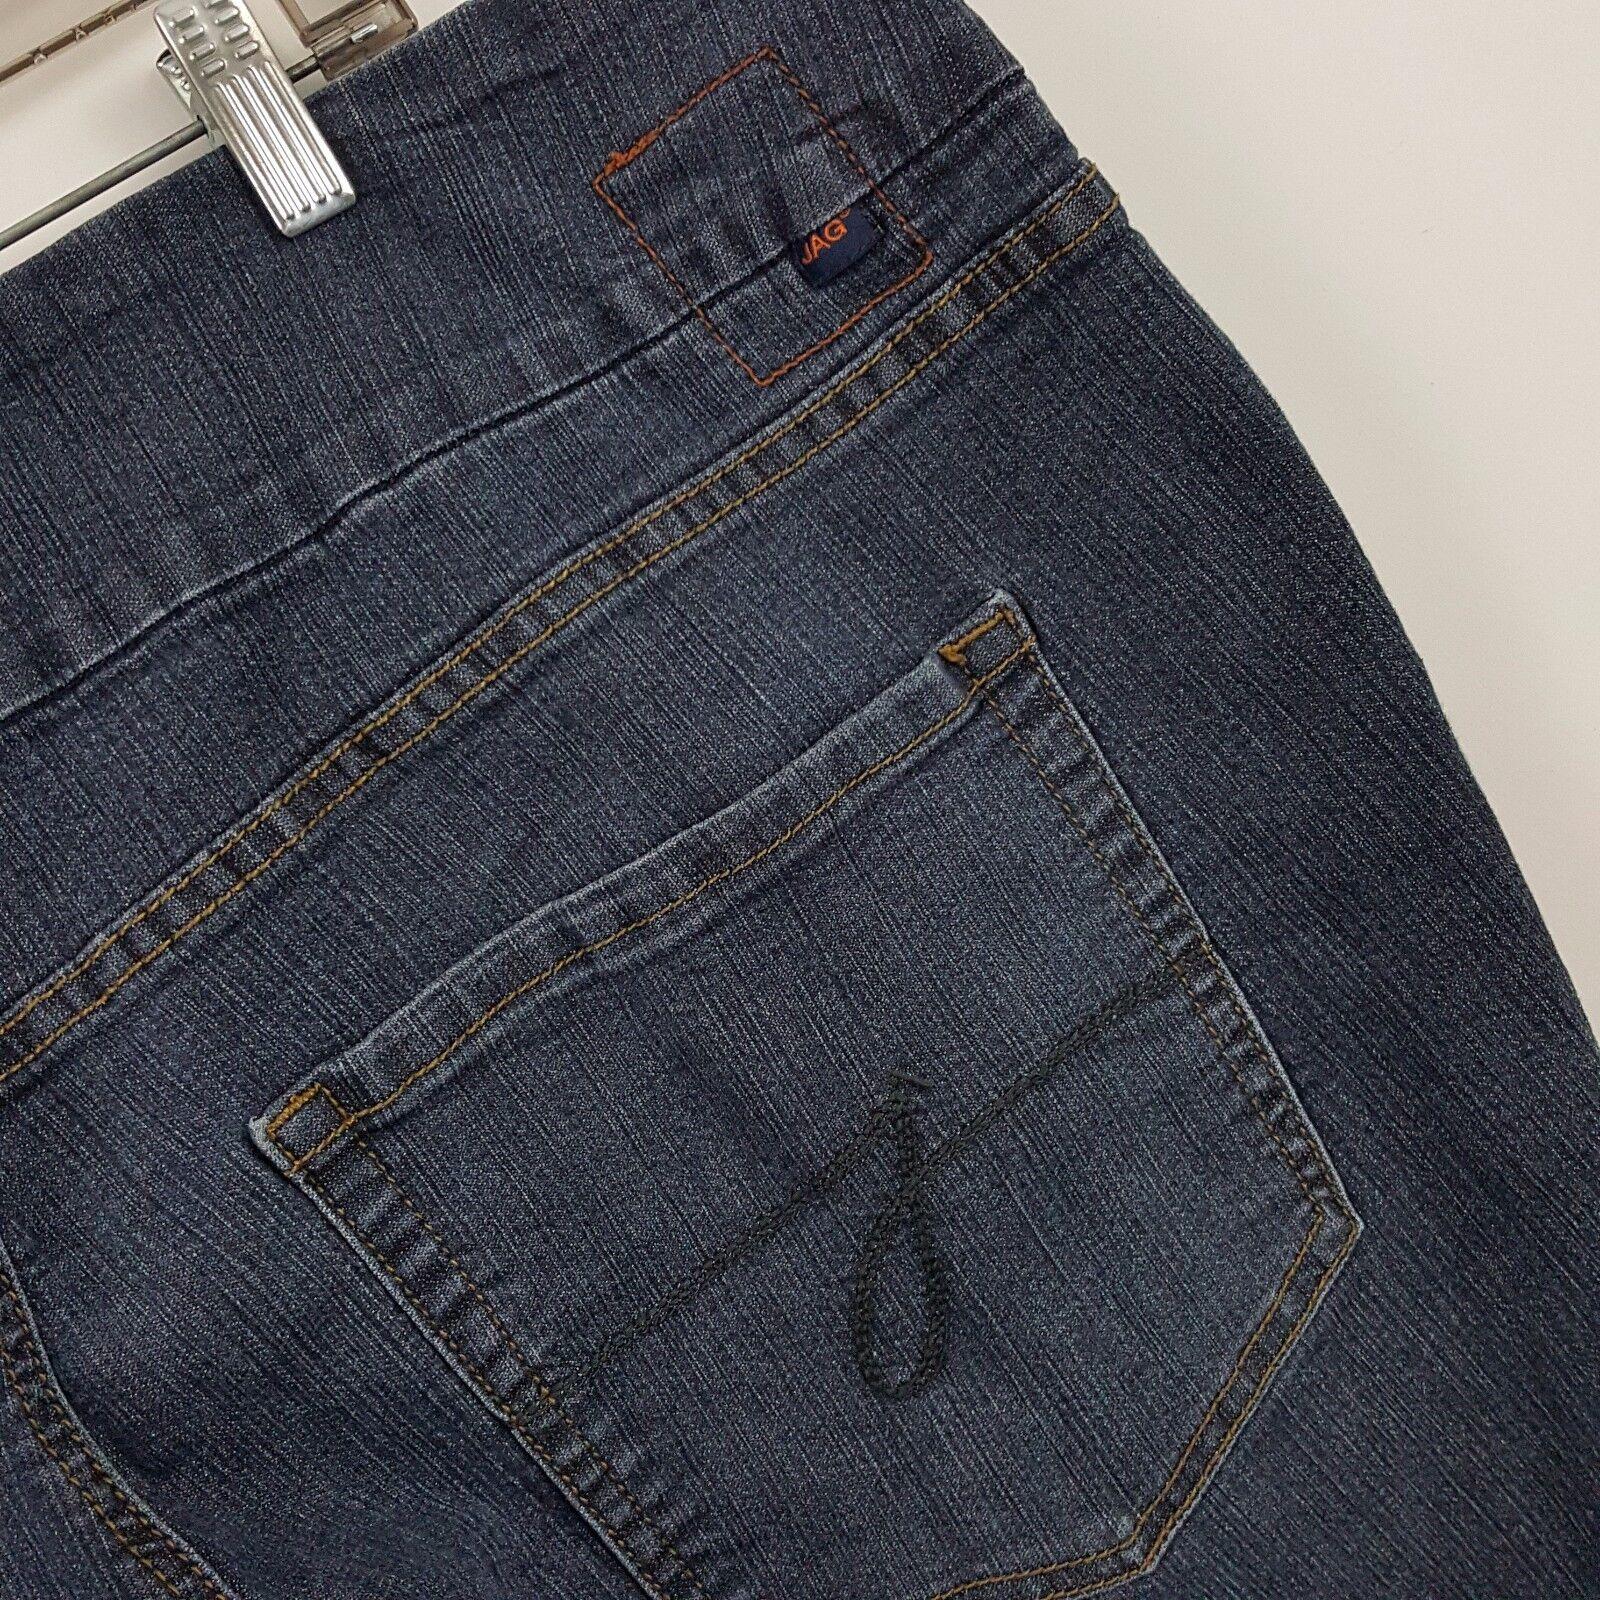 Jag Jeans Pull On High Rise Boot Cut Womens Dark Wash bluee Jeans Sz 24W - 42x29